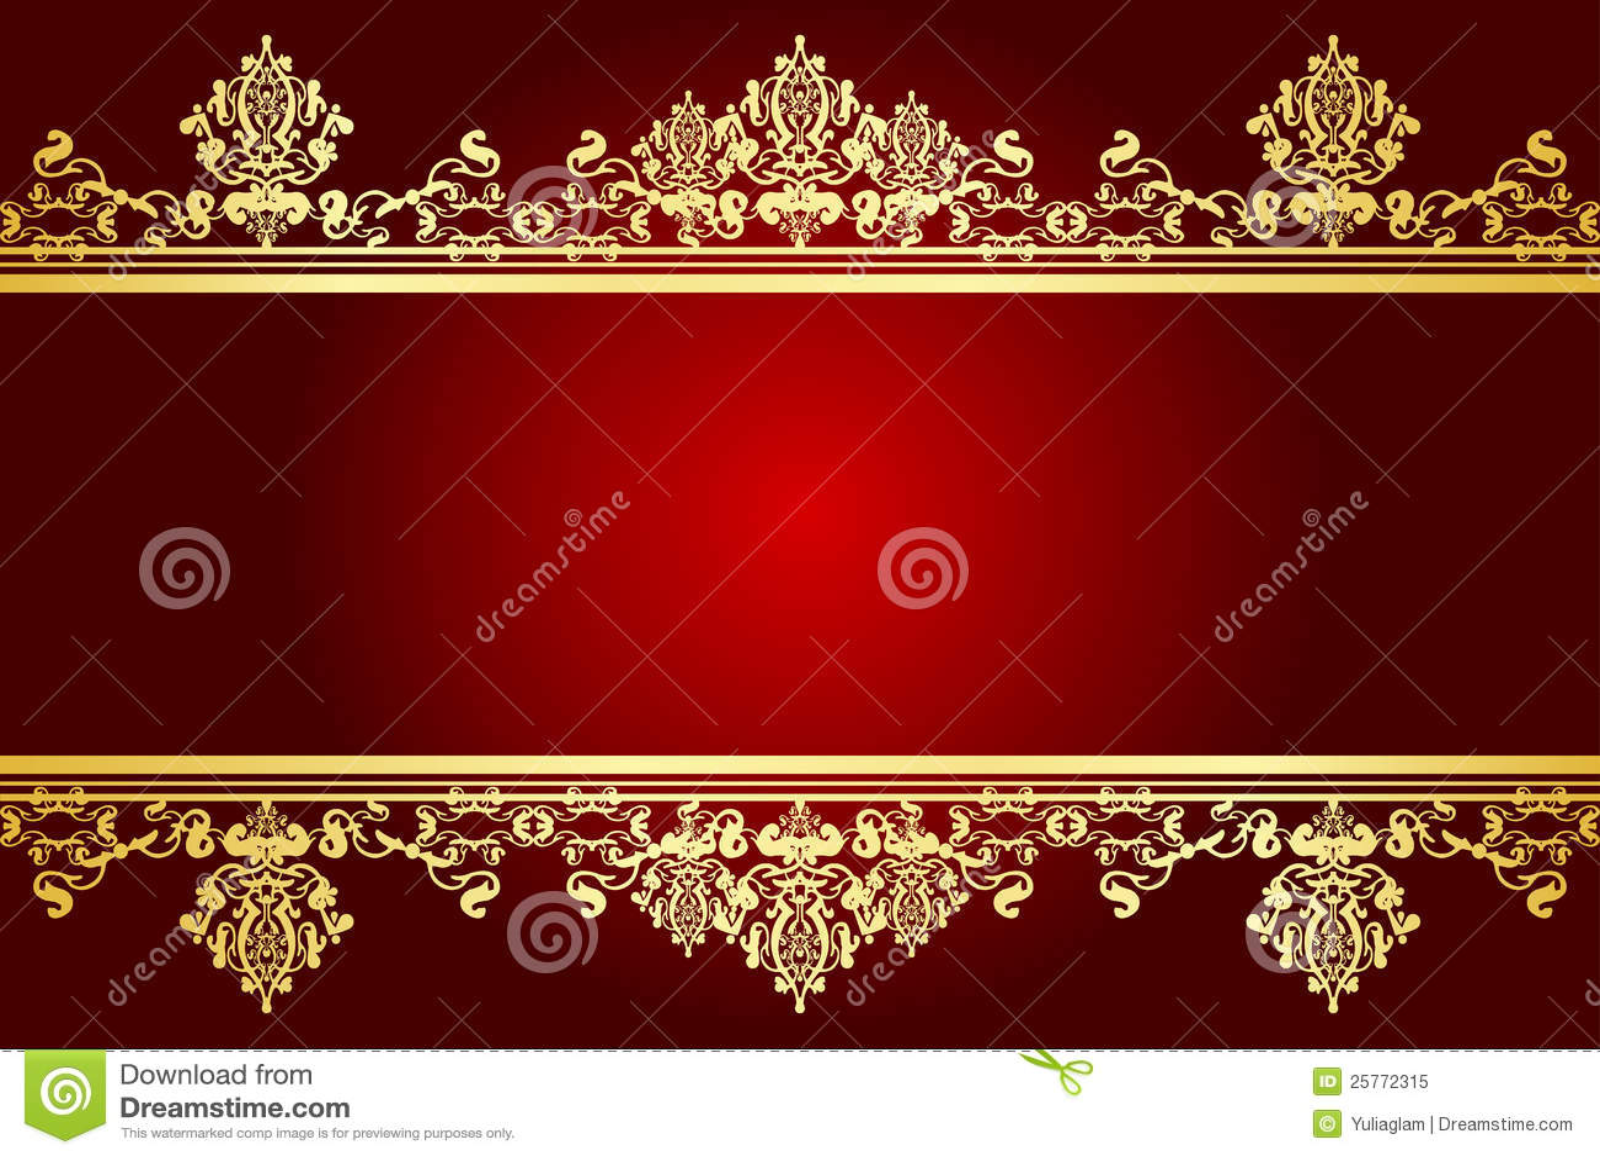 red and gold frame stock illustration illustration of